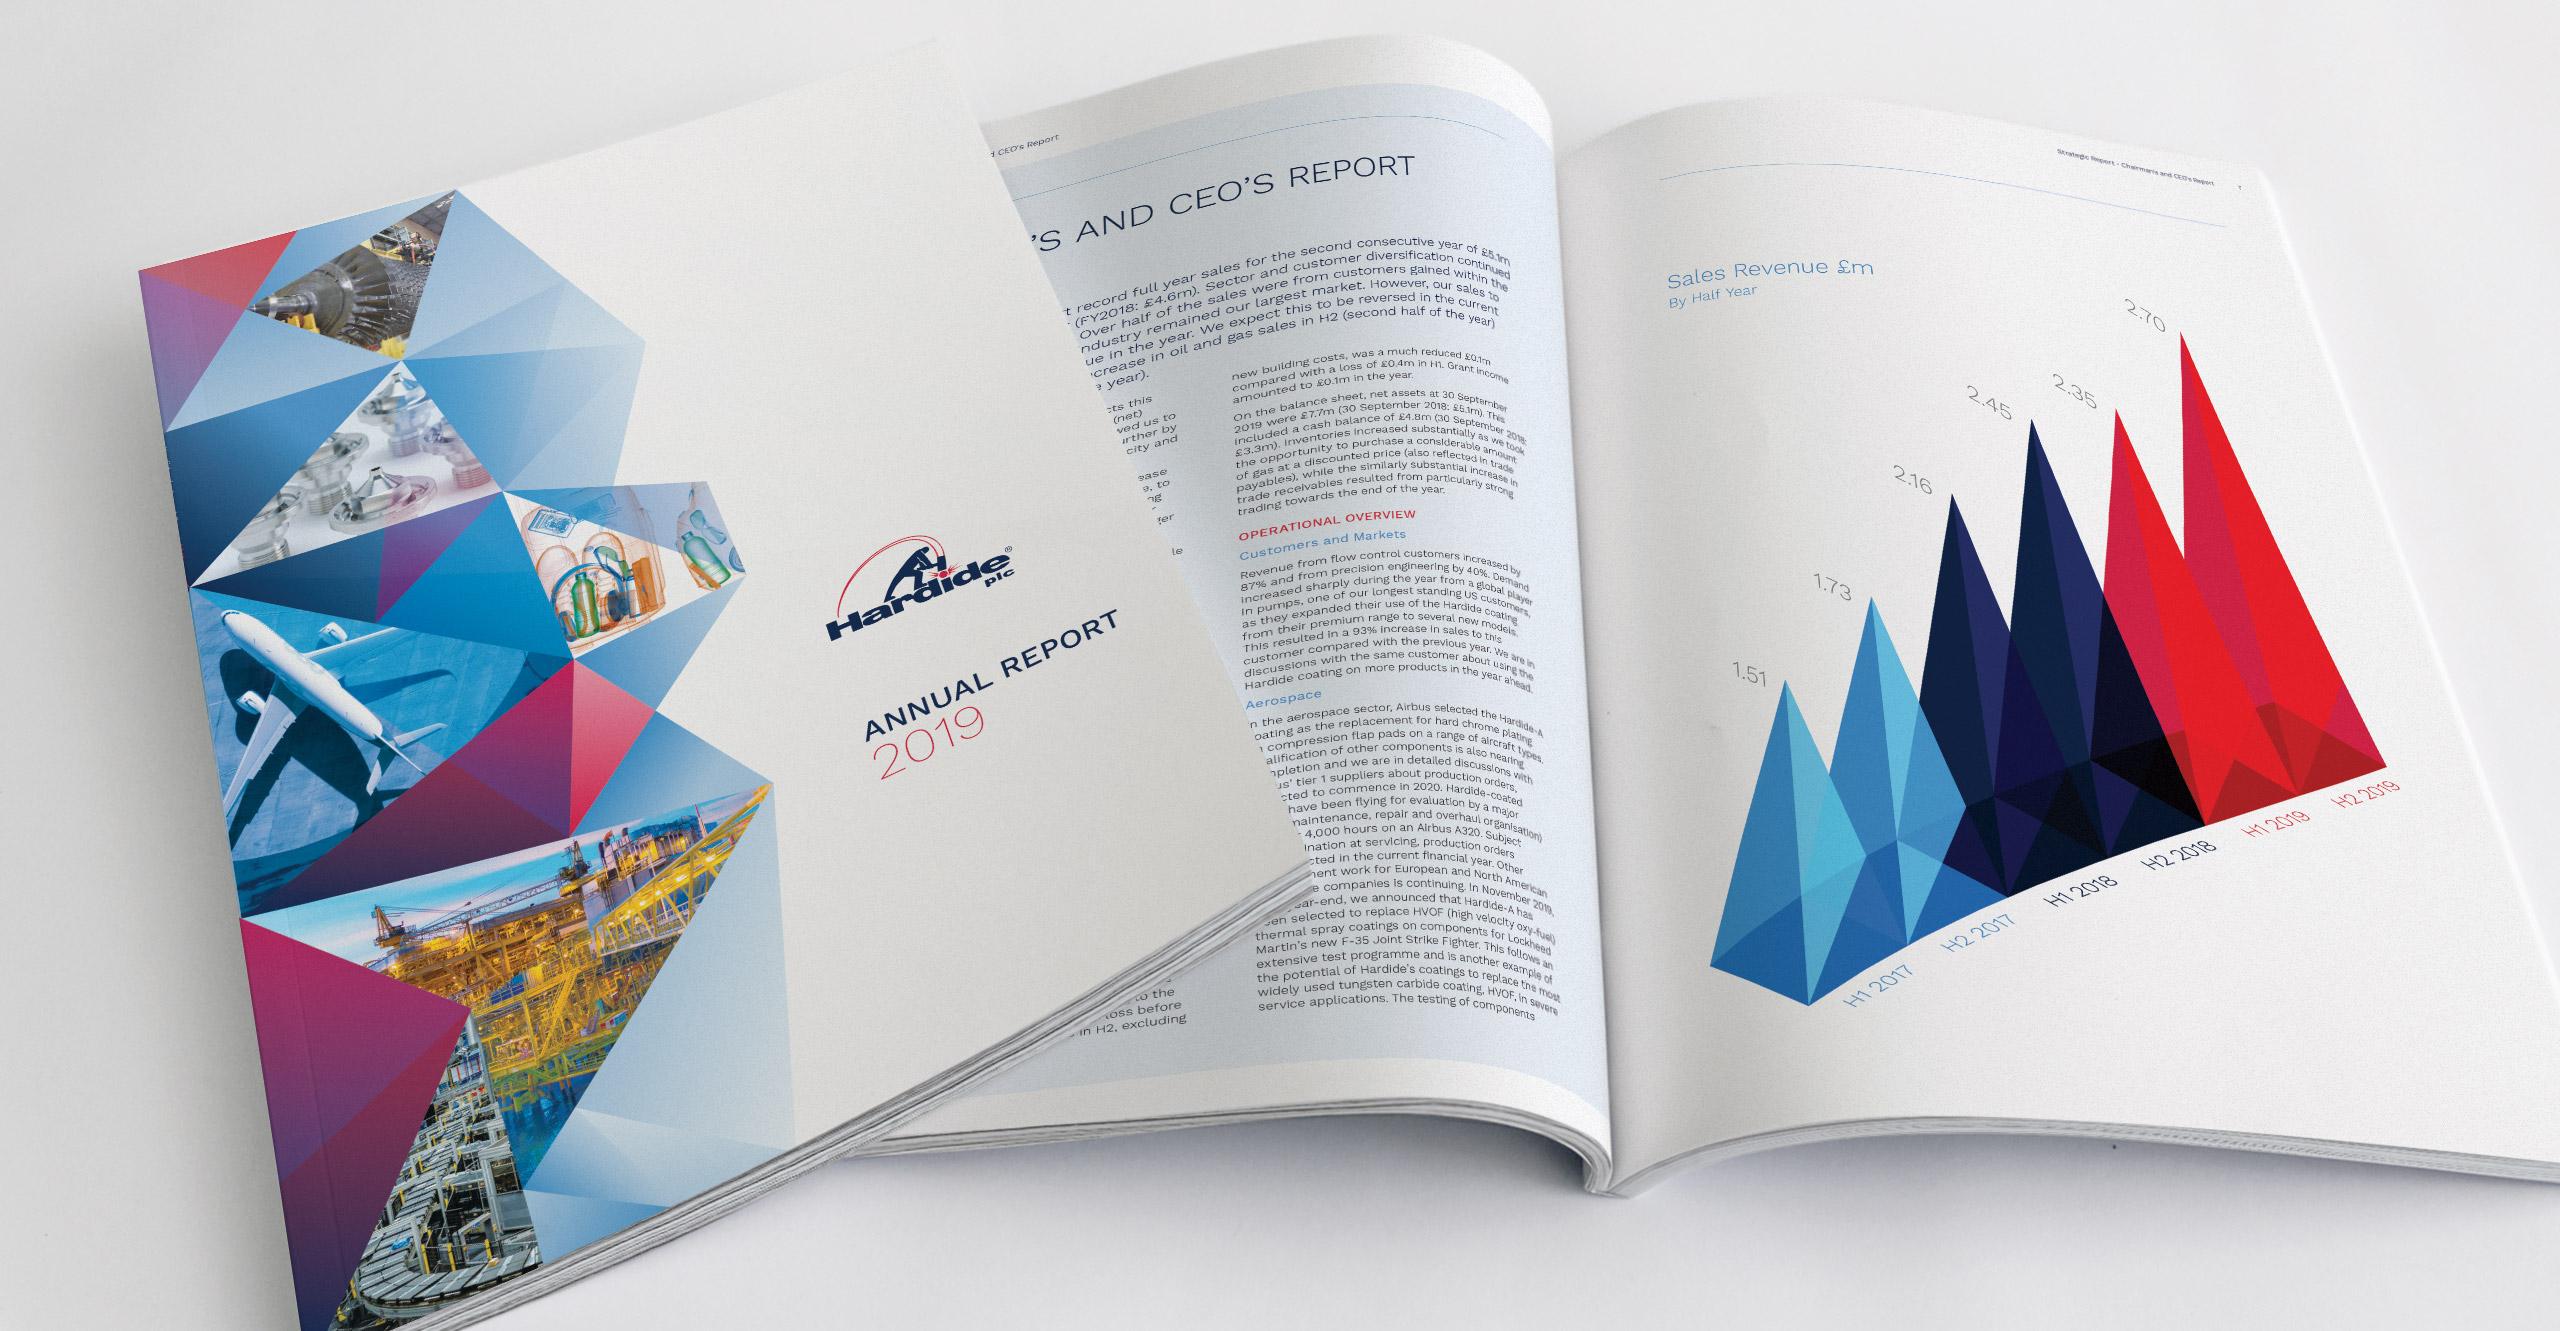 Annual Report Design - Hardide plc 2019